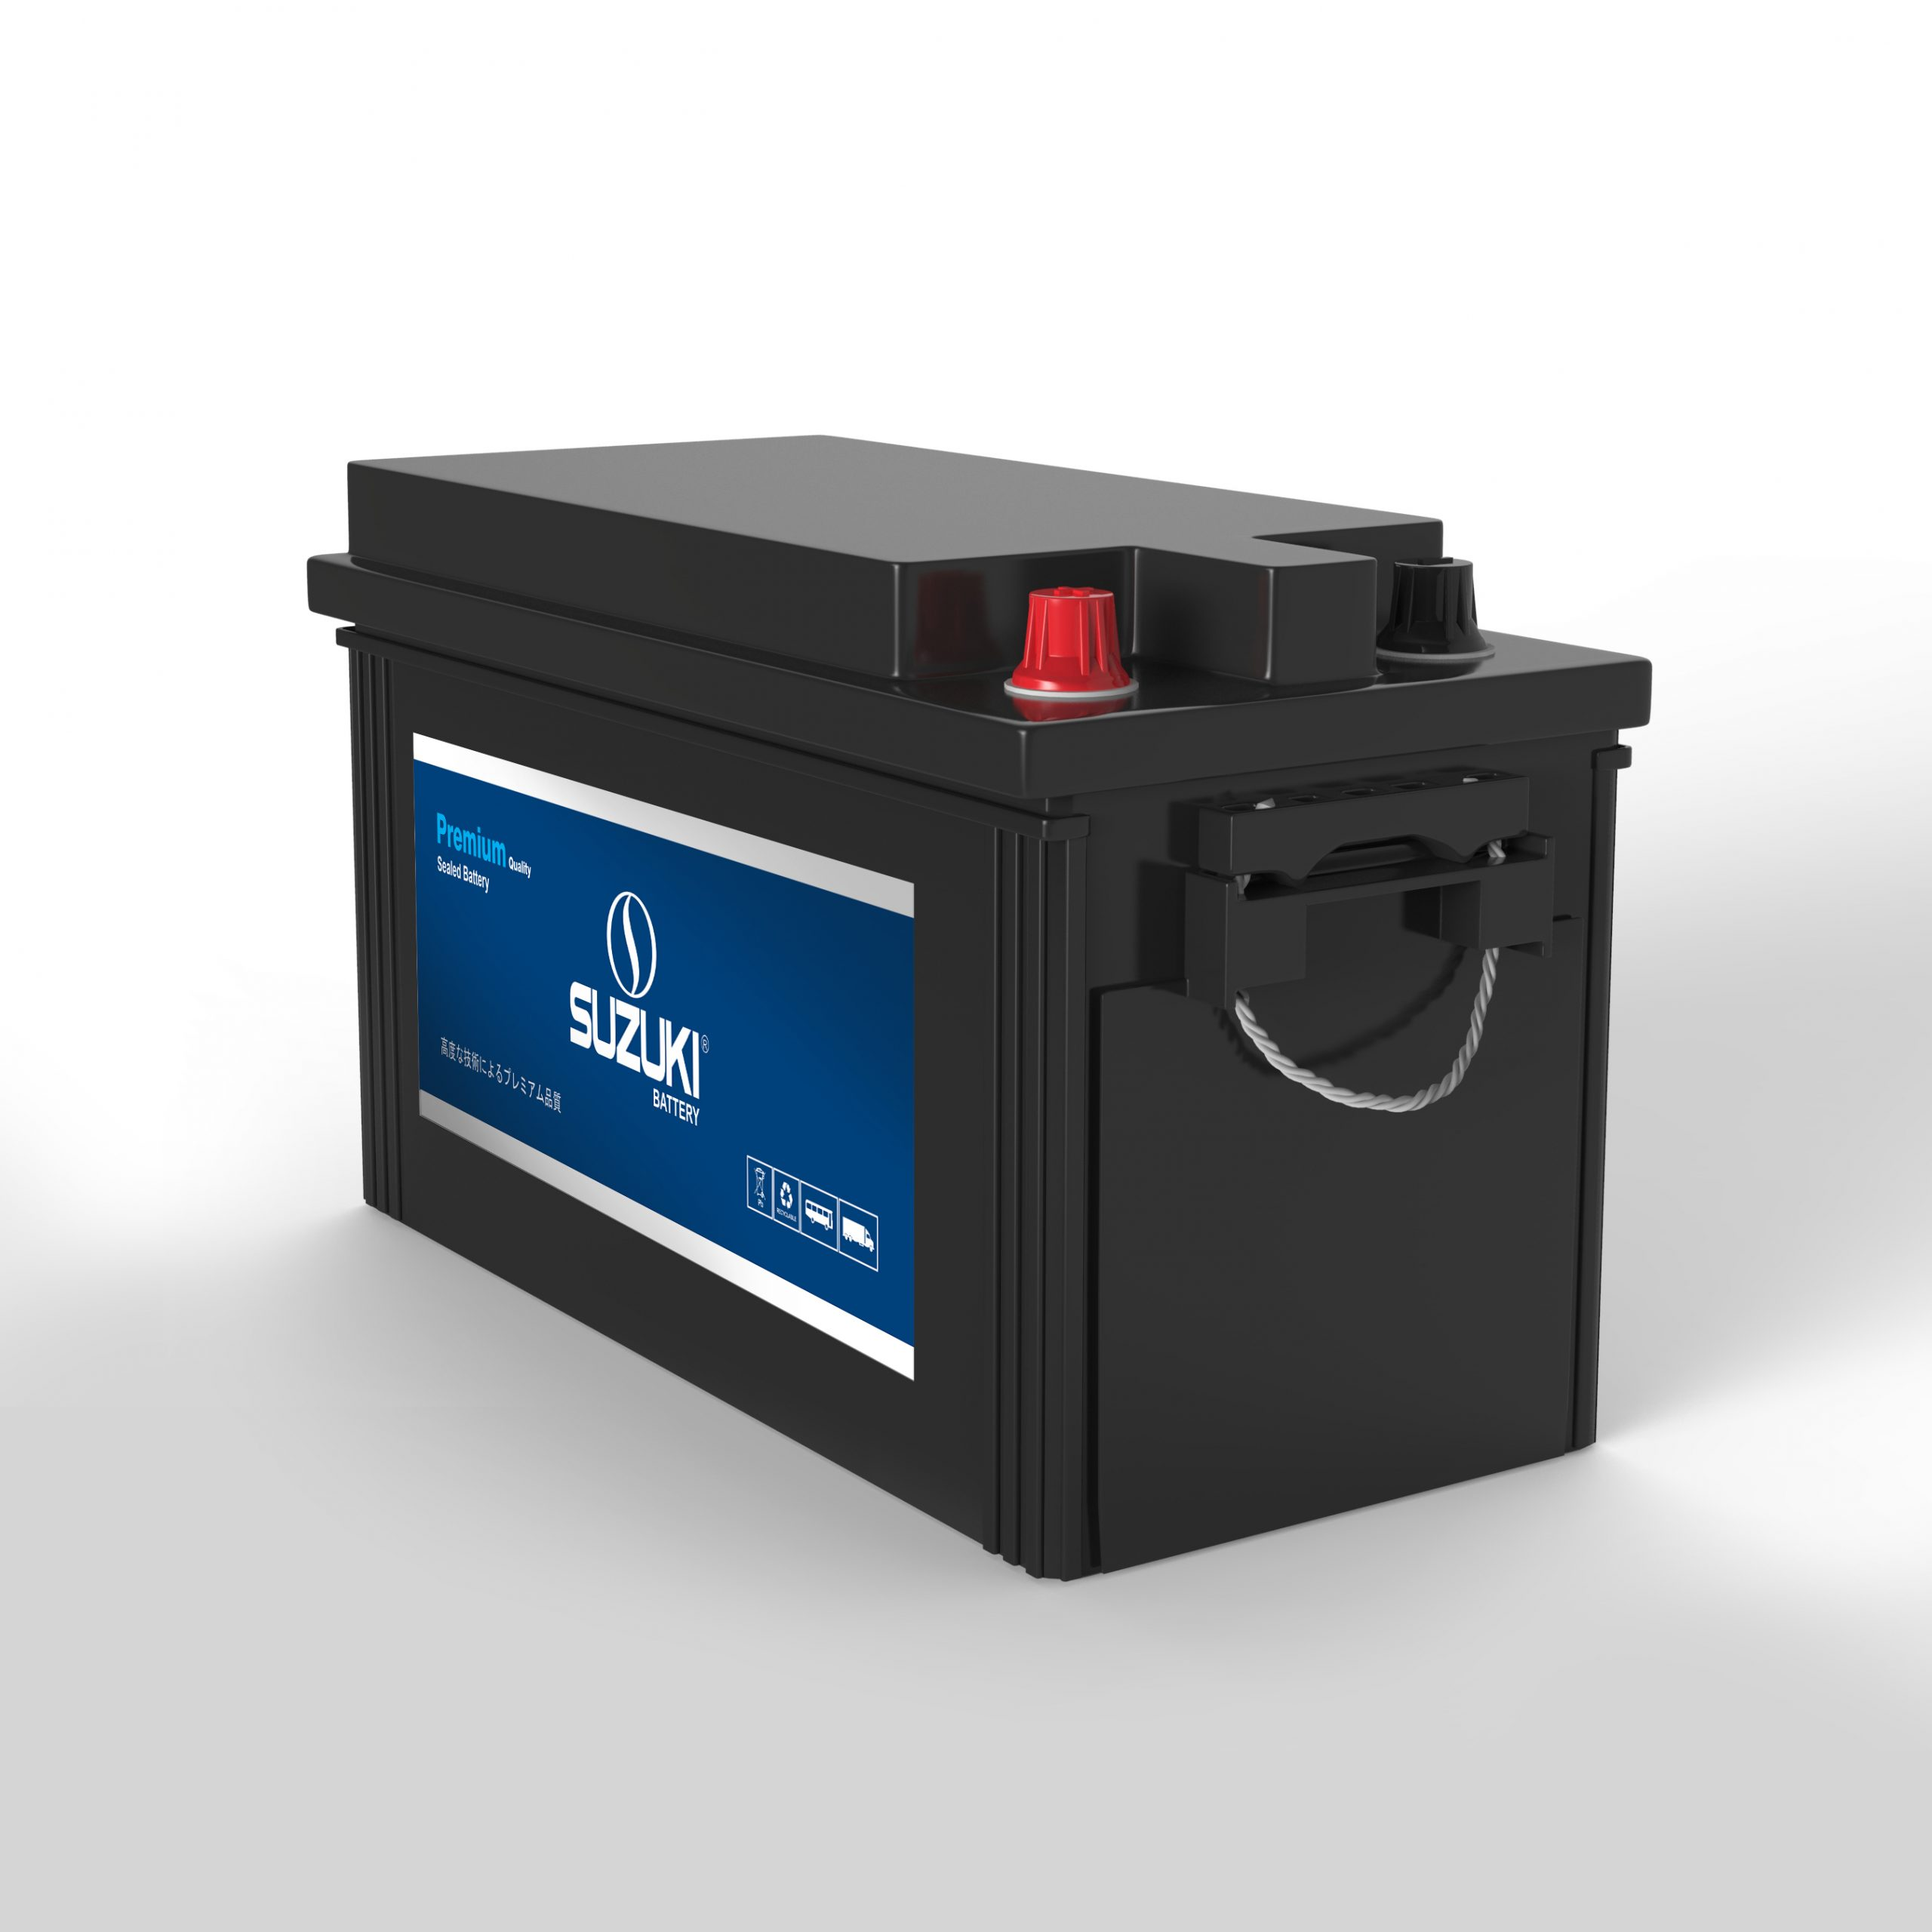 Suzuki commercial (Truck) Premium Batteries series